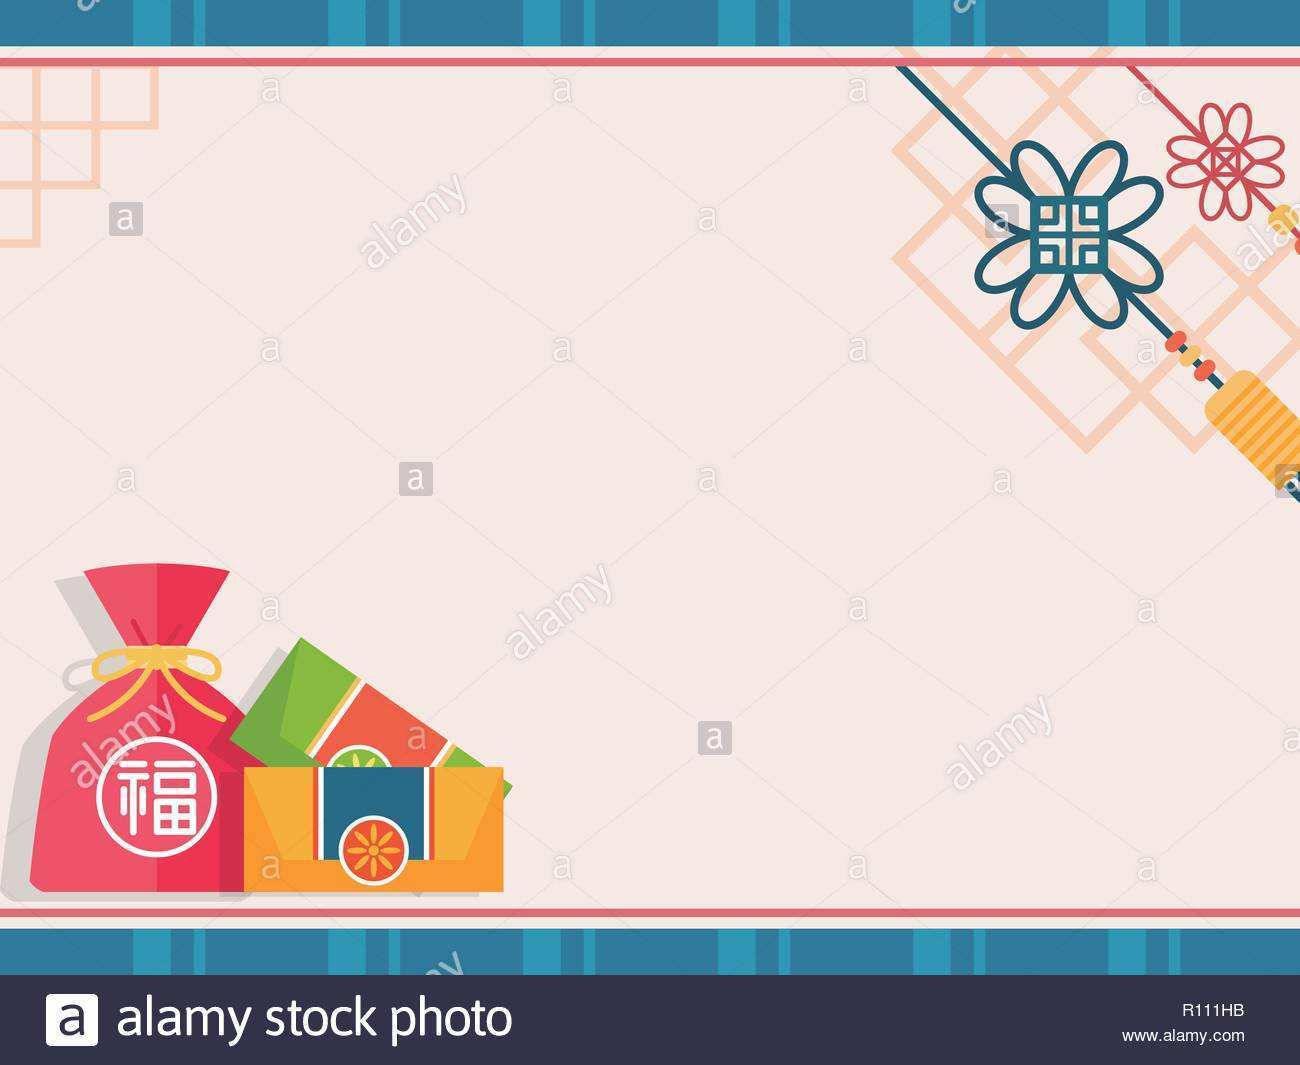 19 How To Create Korean Birthday Card Template Psd File For Korean Birthday Card Template Cards Design Templates